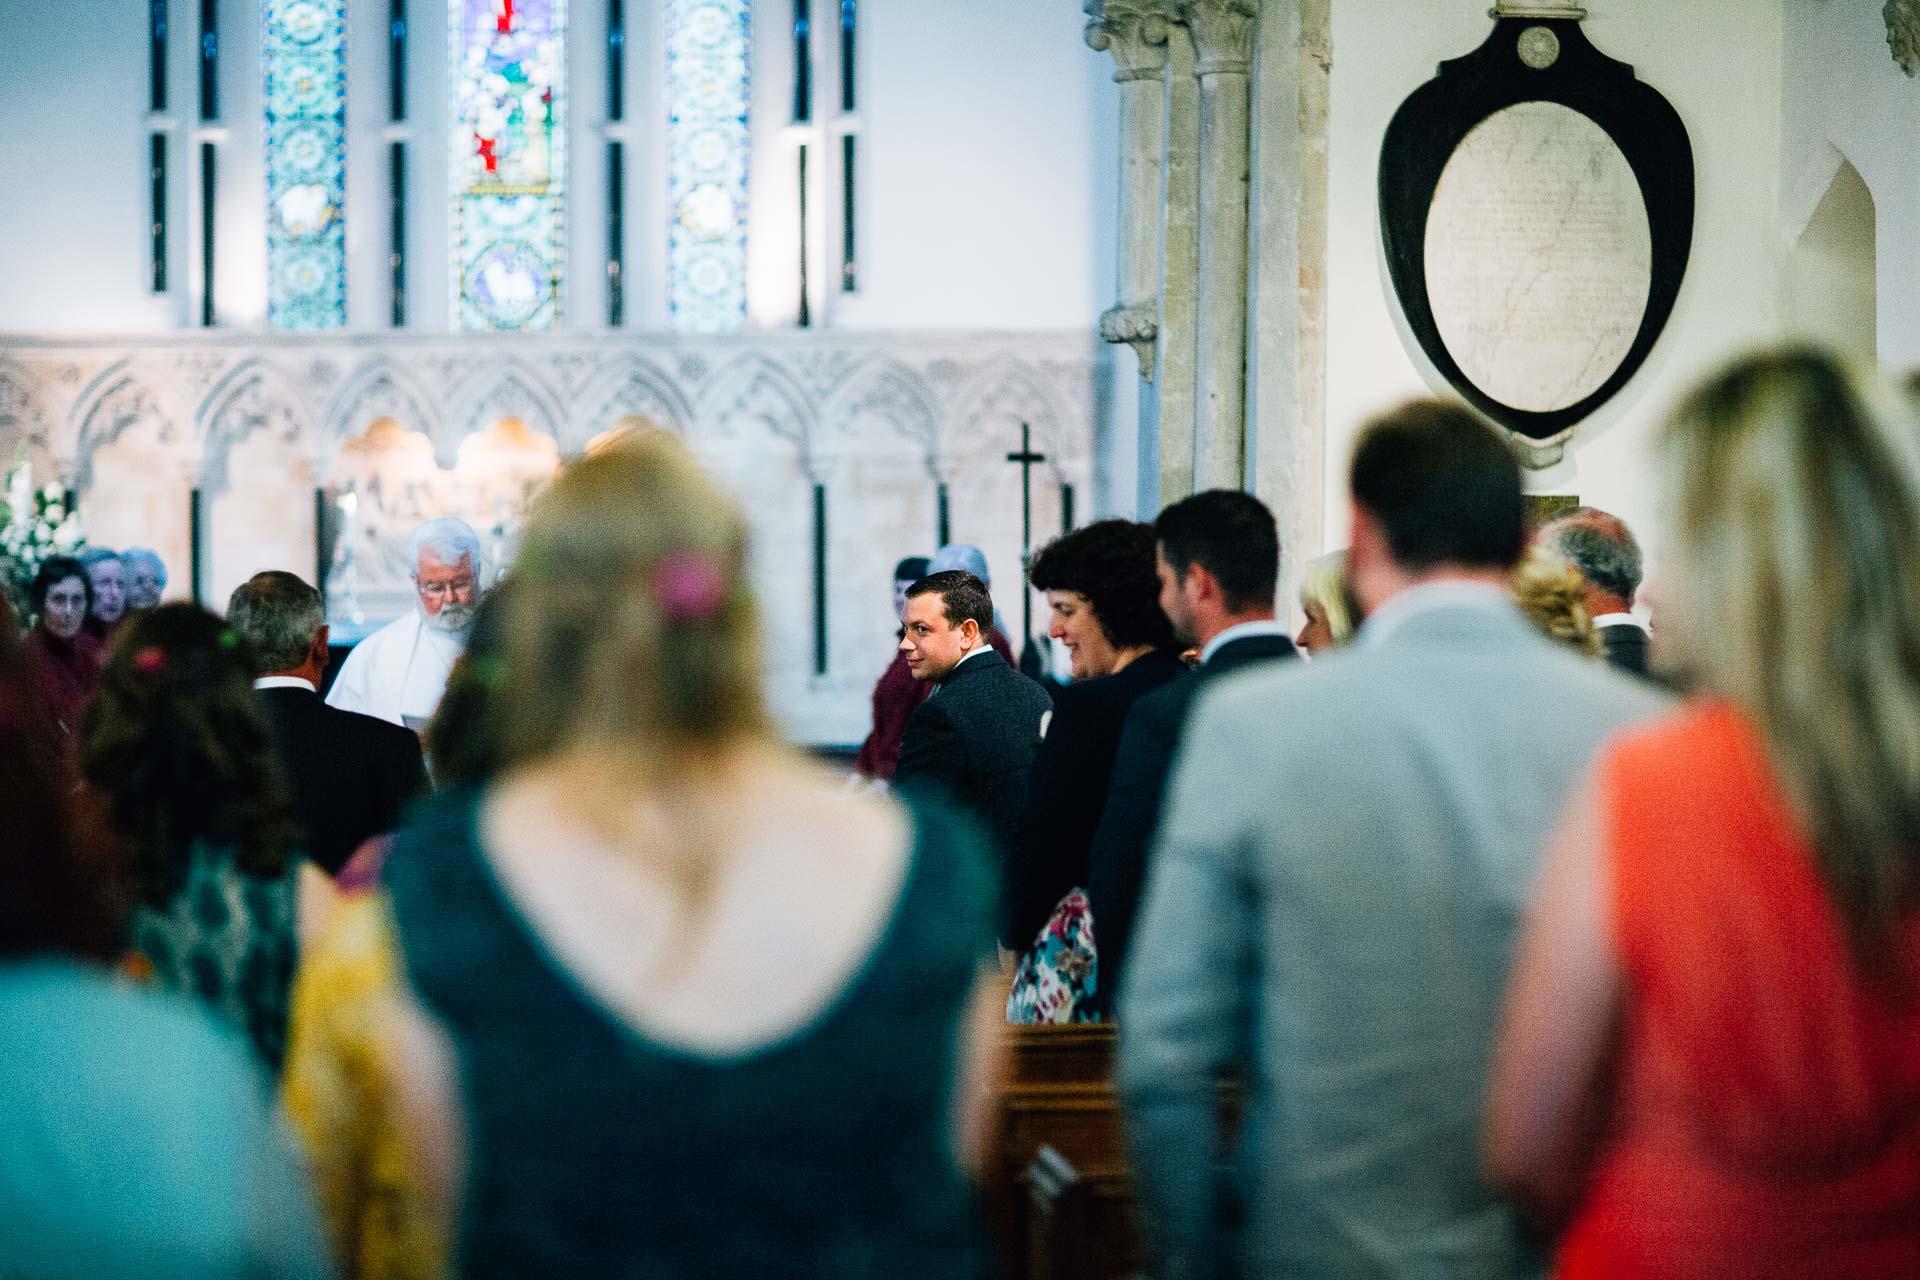 winterbourne-medieval-barn-wedding-photography-emma-andrew-53